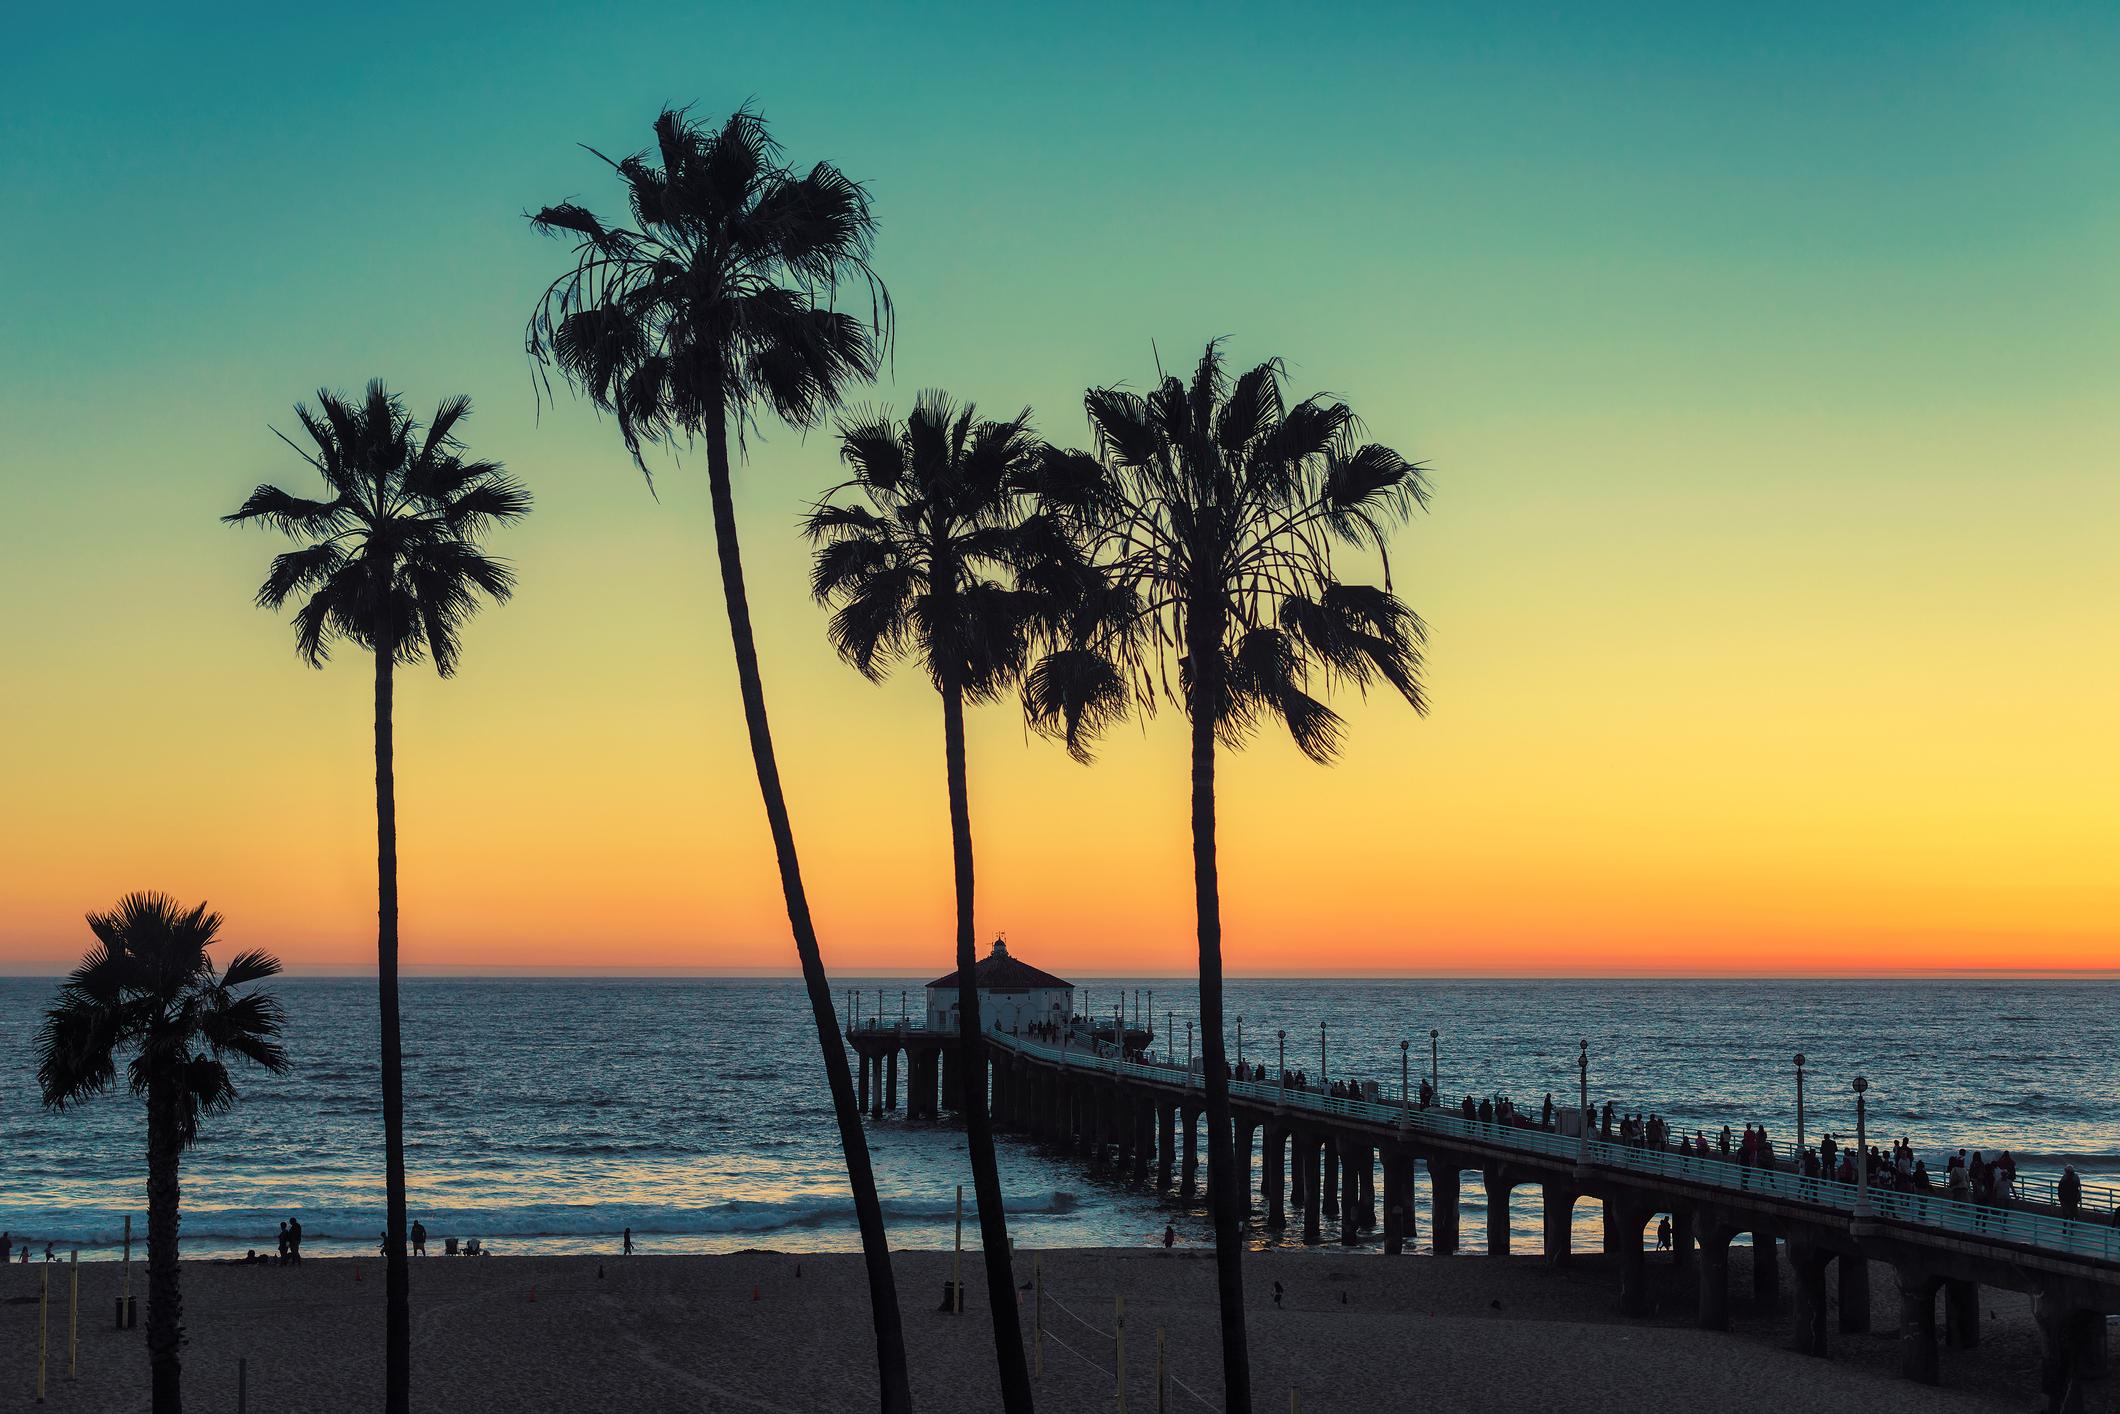 la-beach.jpg